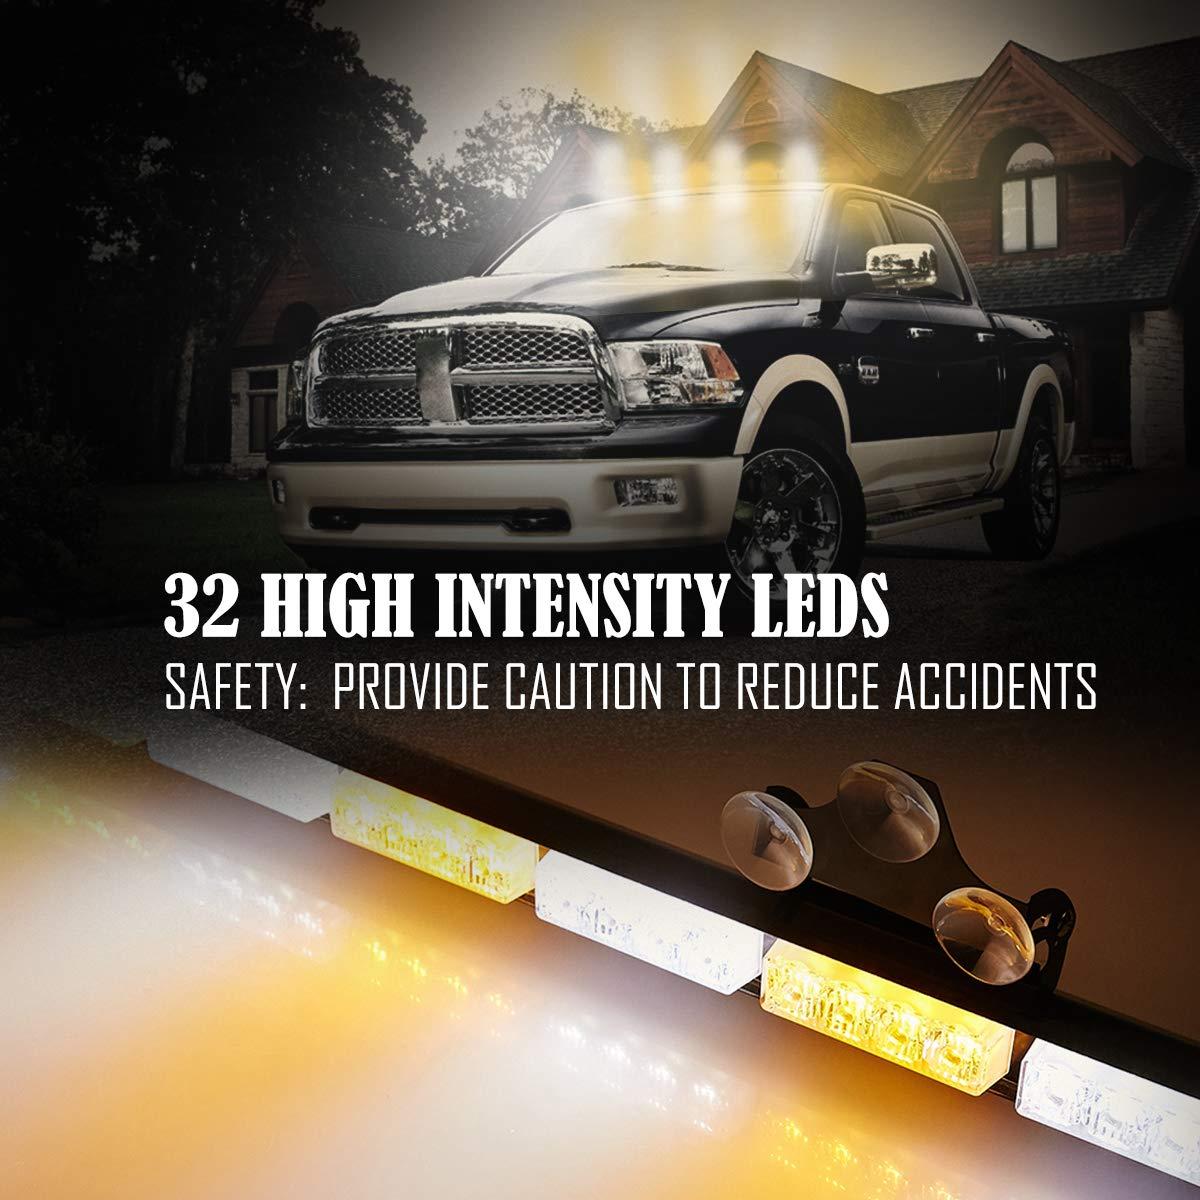 Emergency Light Bar 35.5 Inch 13 Flash Patterns 32 Led Warning Lights Traffic Advisor Bar Yellow Strobe Safety Lights with Cigar Lighter 35. 5 Inch, Yellow